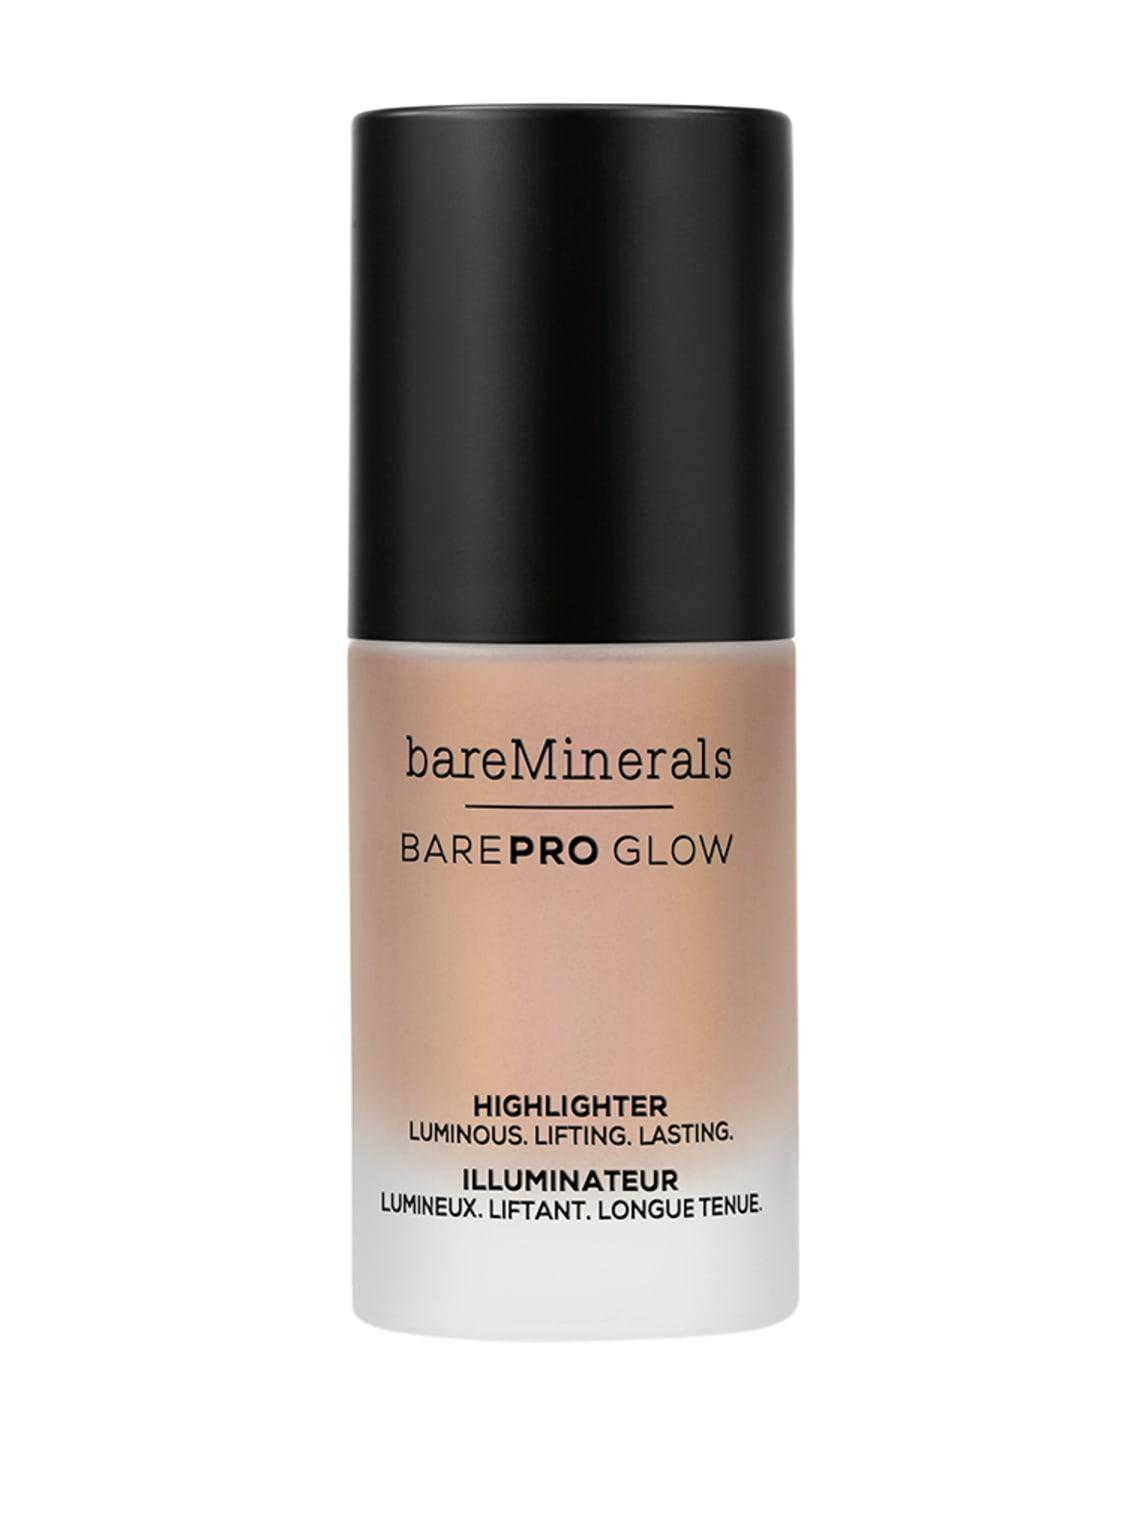 Image of Bareminerals Barepro Glow Highlighter